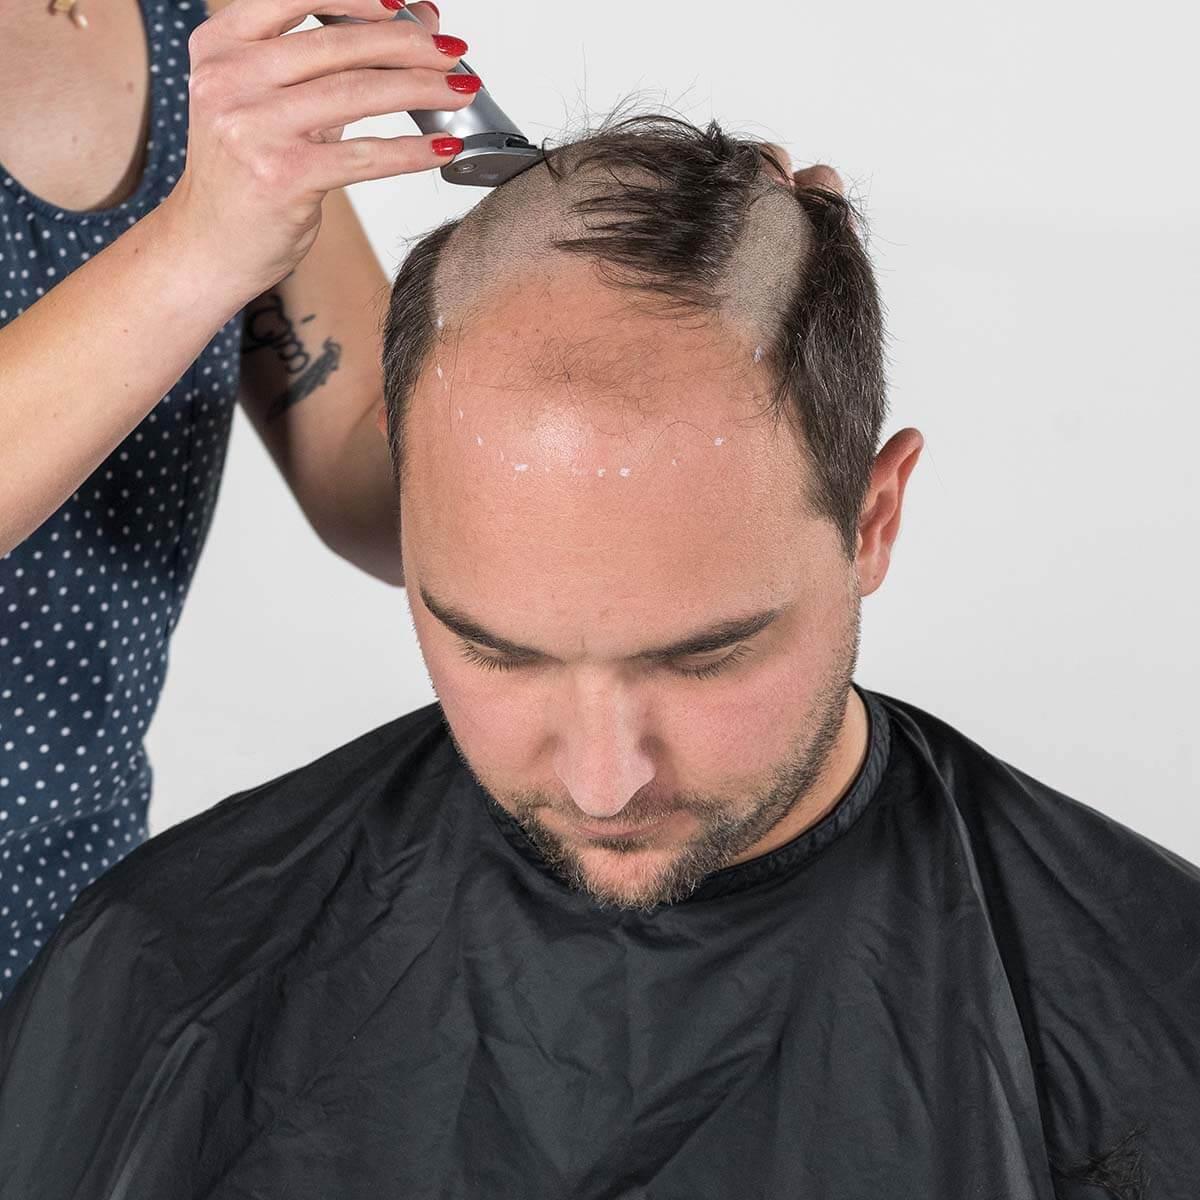 Haarteile Nach Maß Toupets Mit Echthaar Mittel Gegen Haarausfall